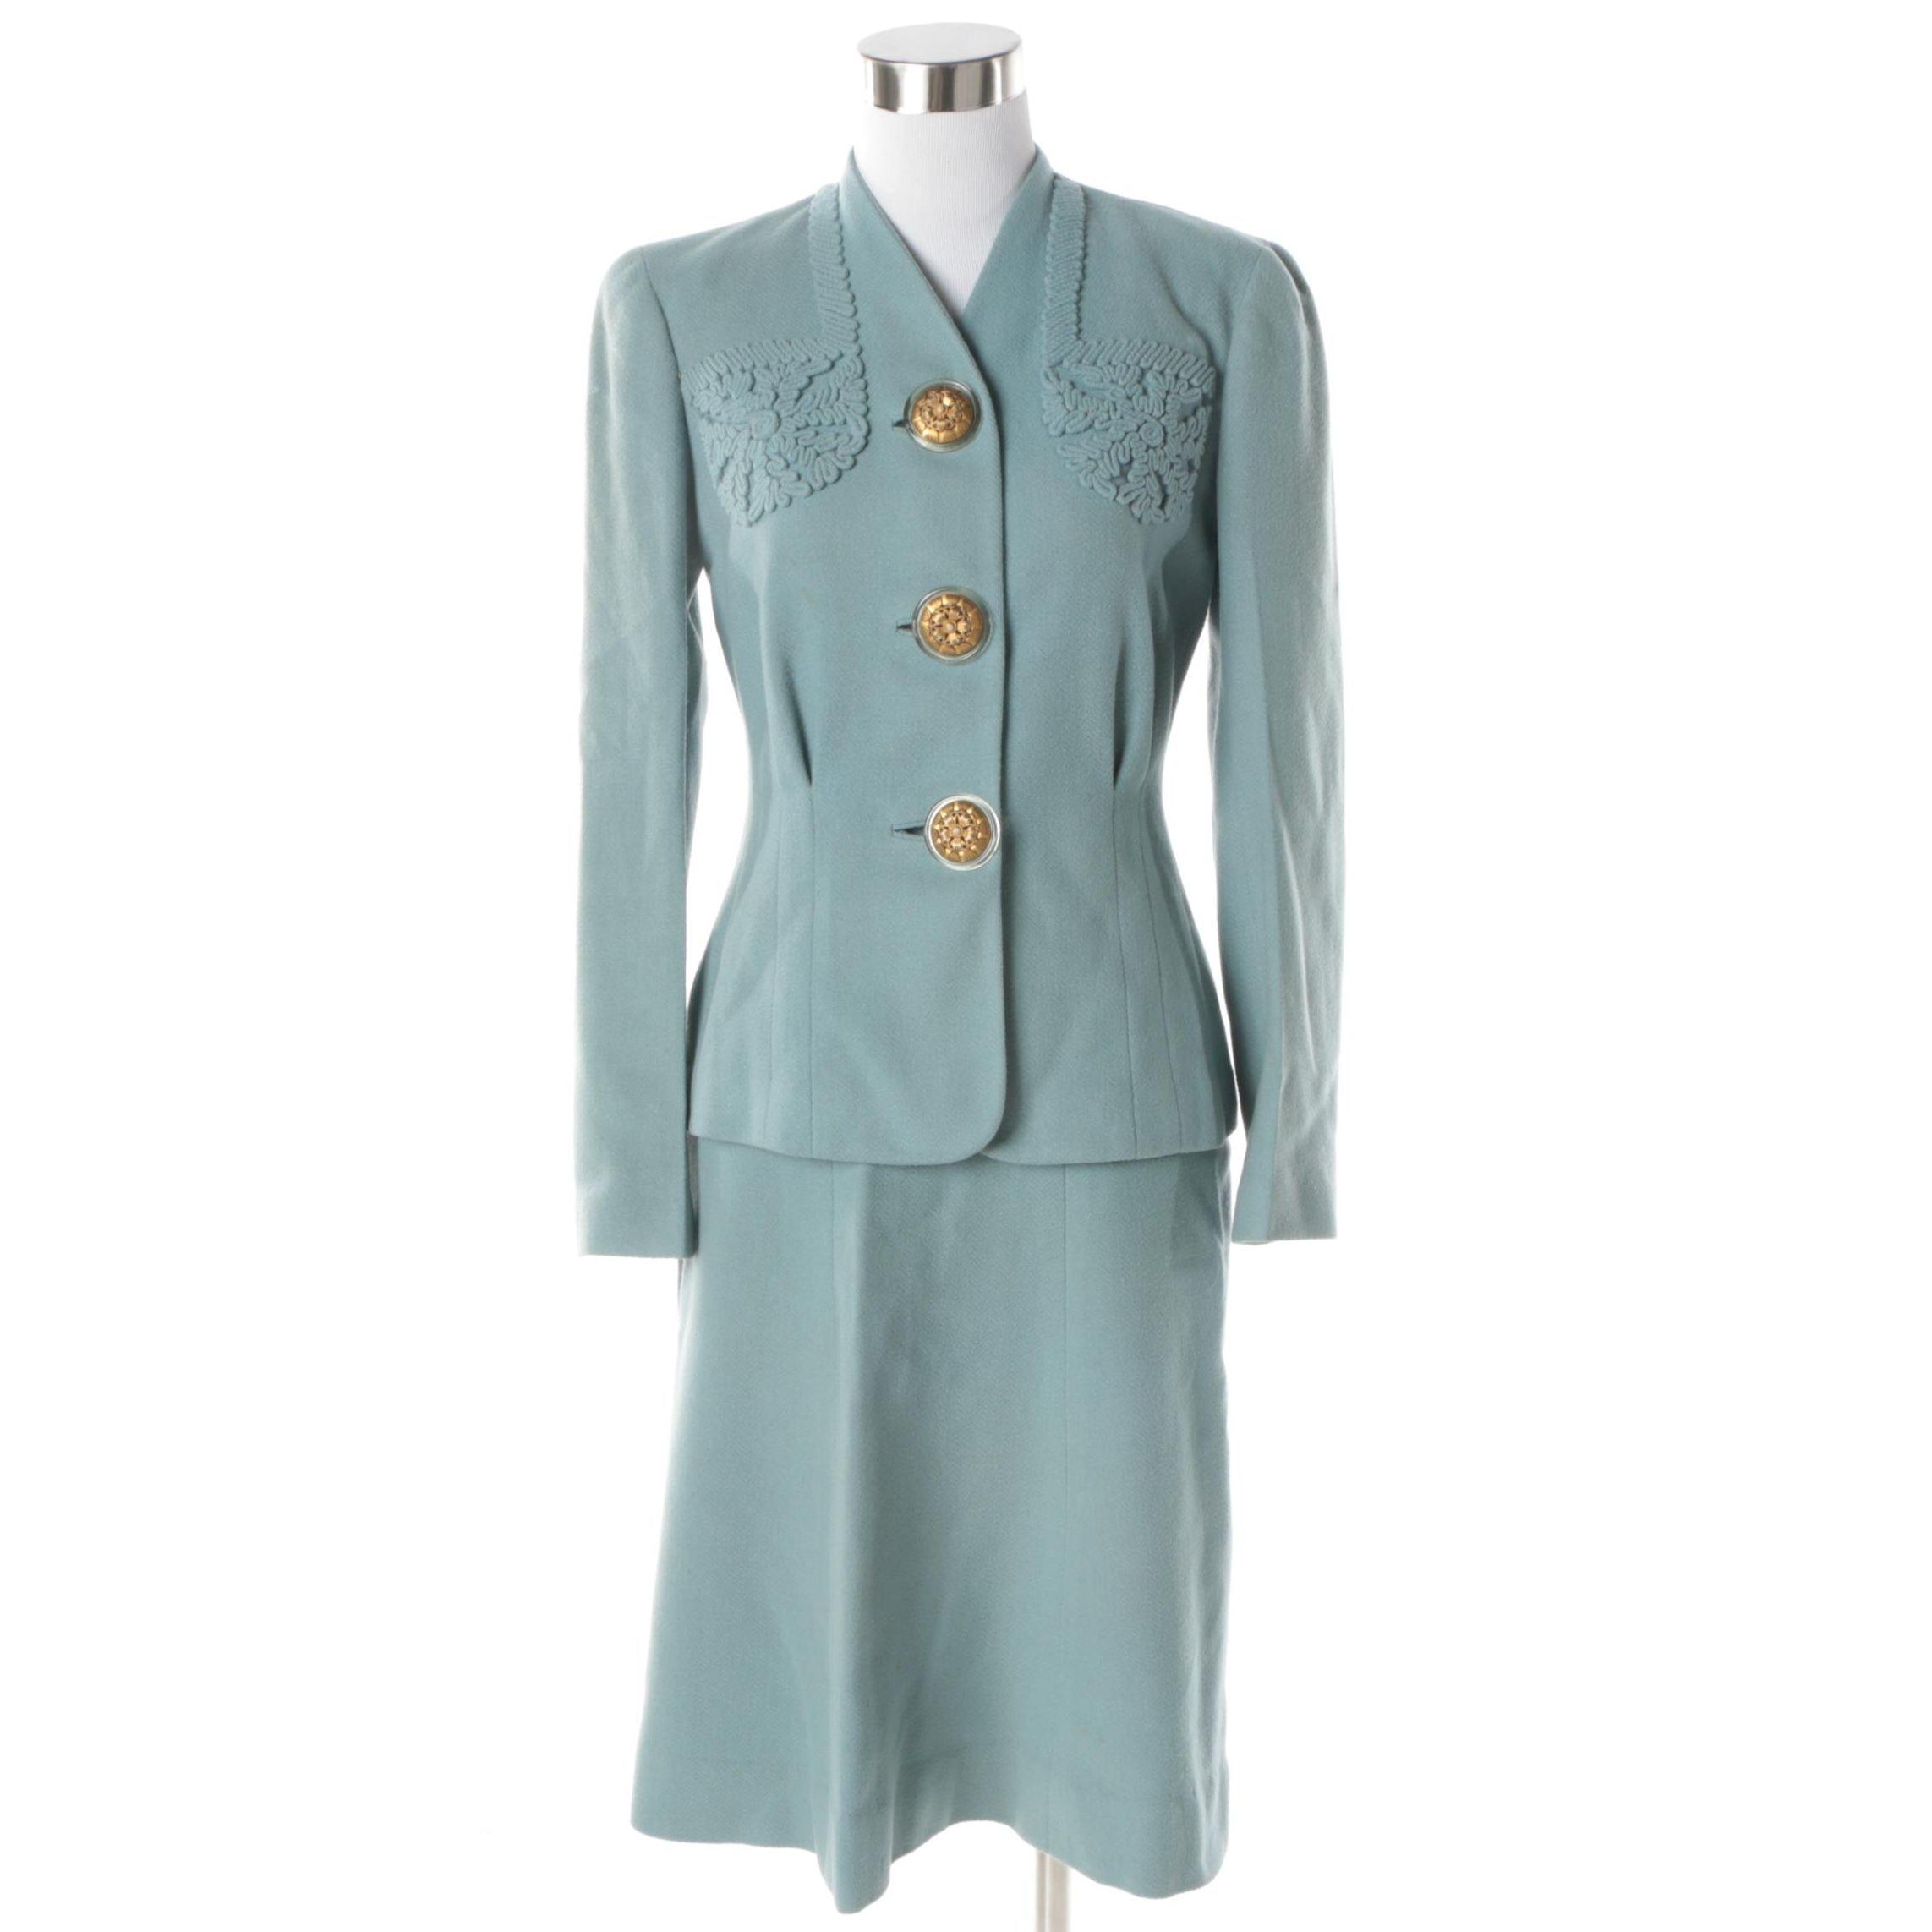 Women S Circa 1940s Vintage Light Blue Wool Skirt Suit Ebth